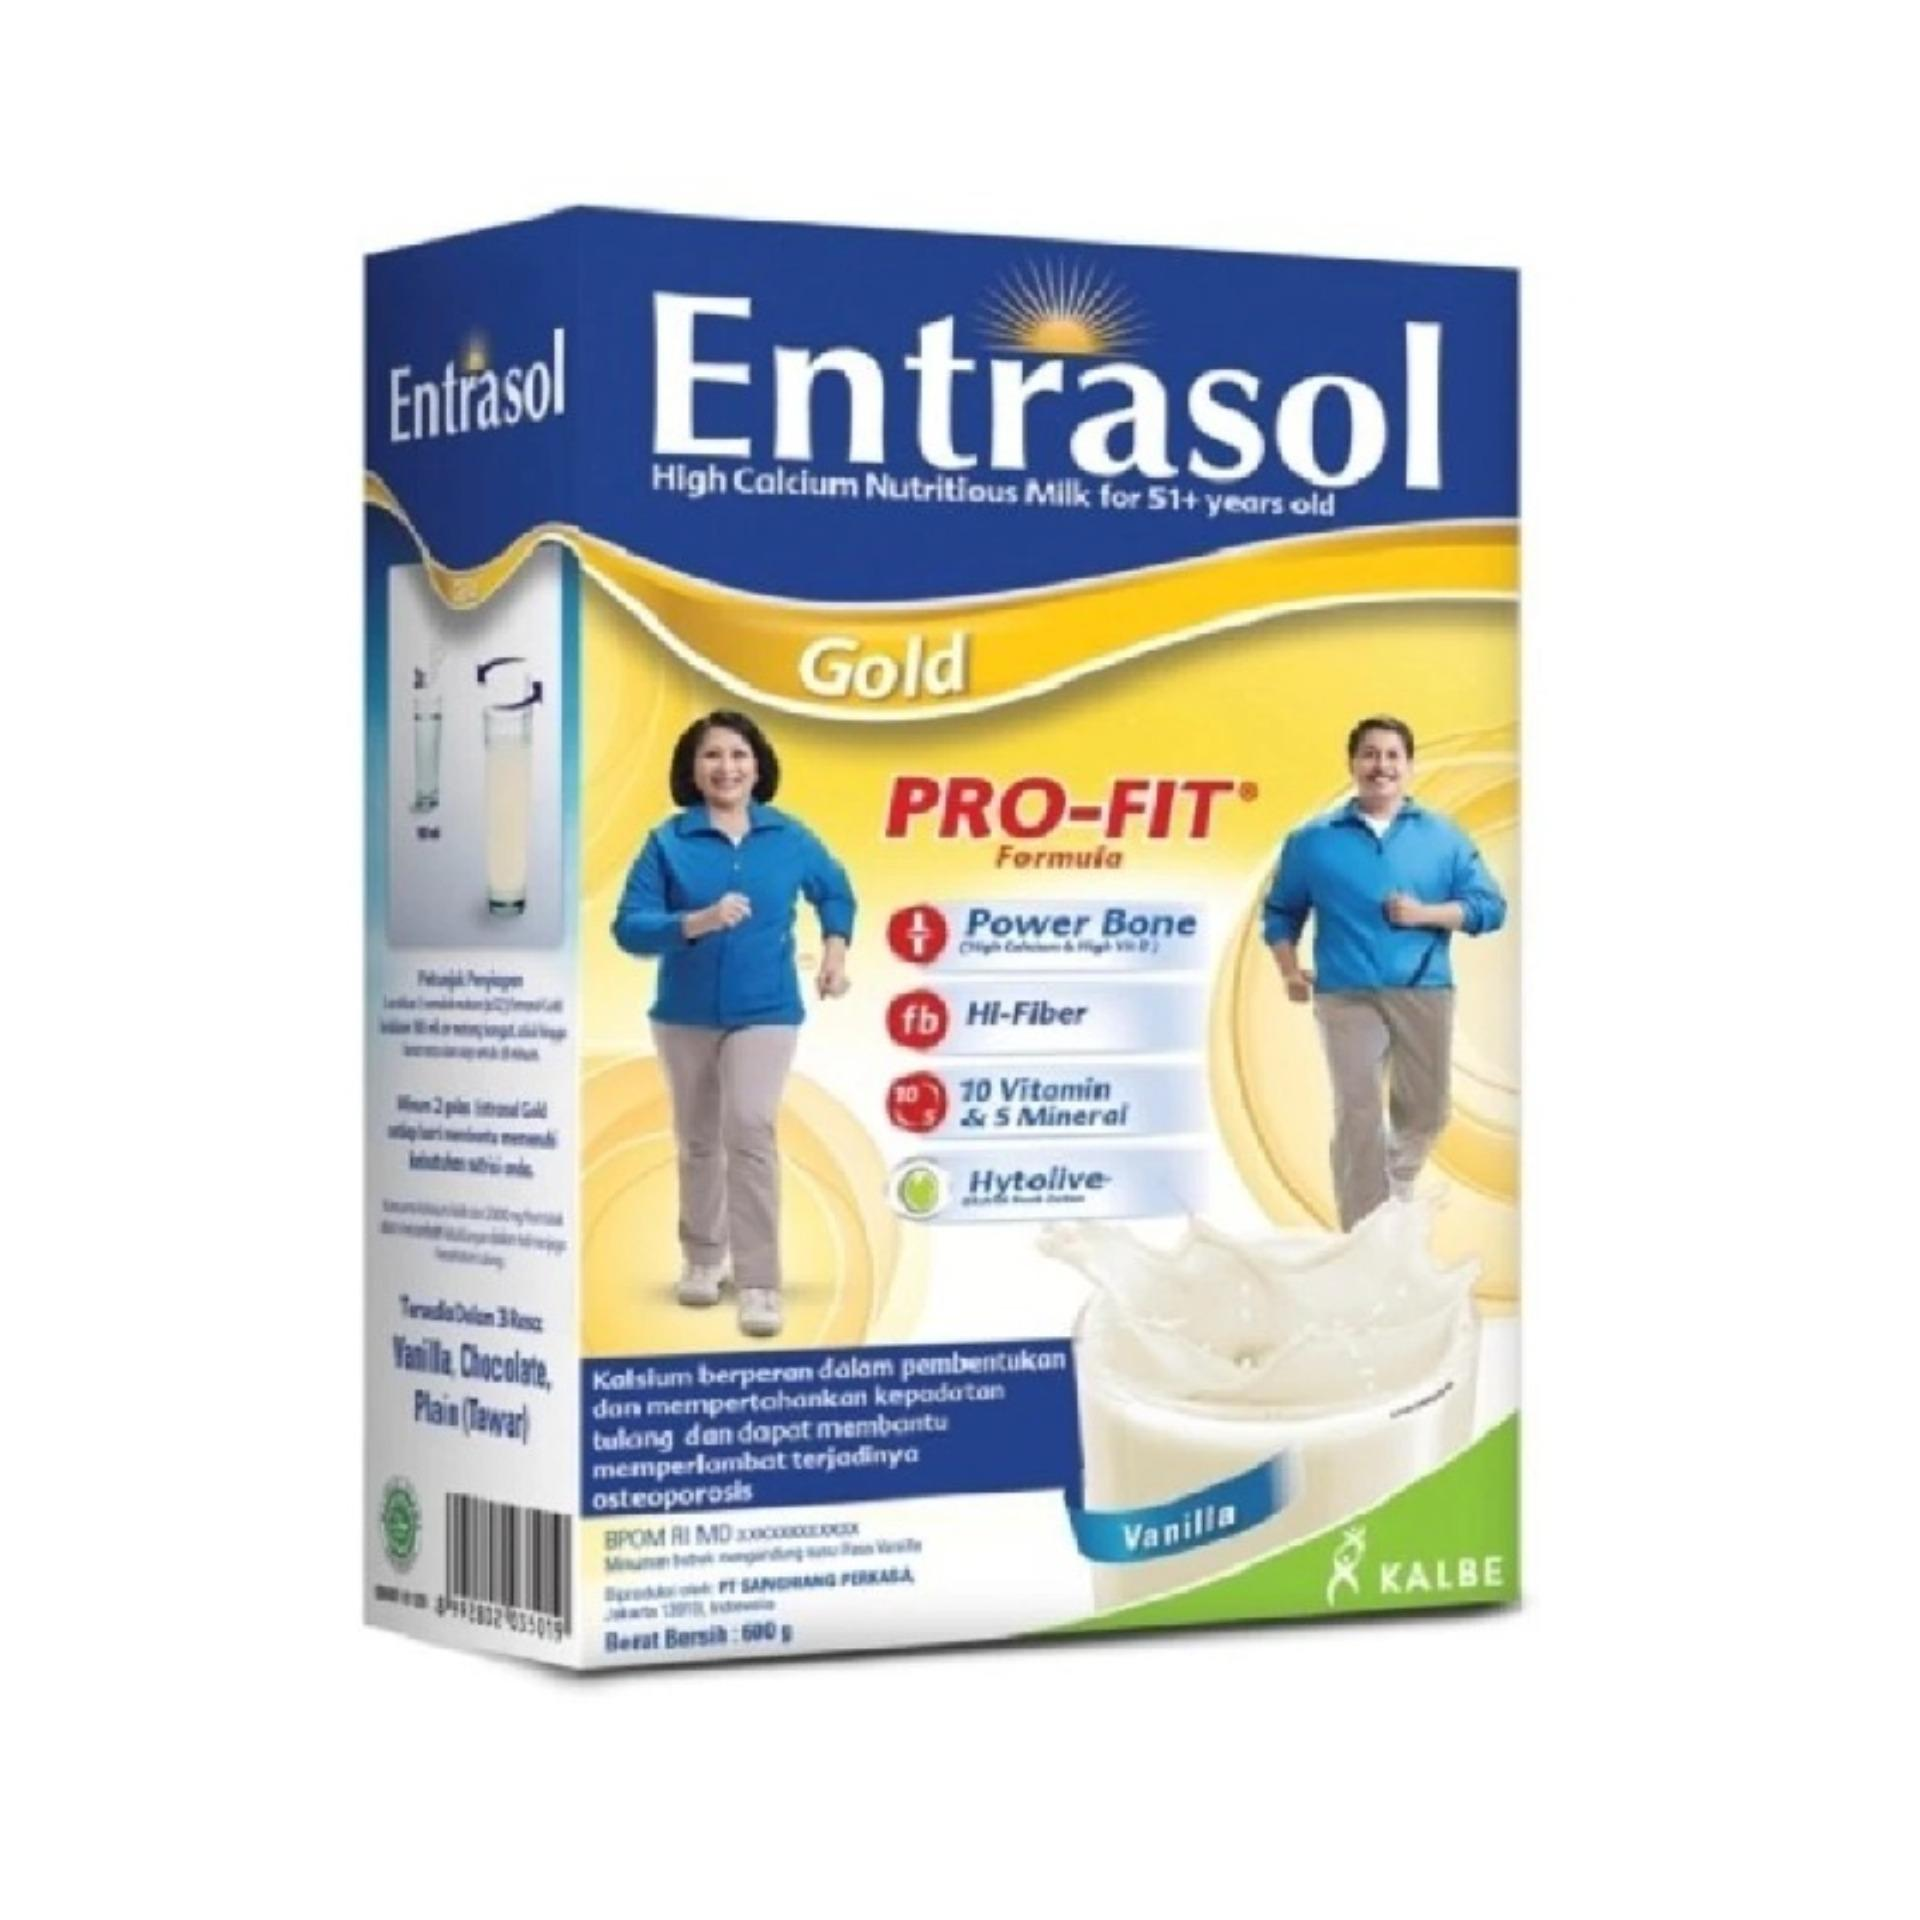 ENTRASOL Gold PRO-FIT Vanila Box 600g / 600 g